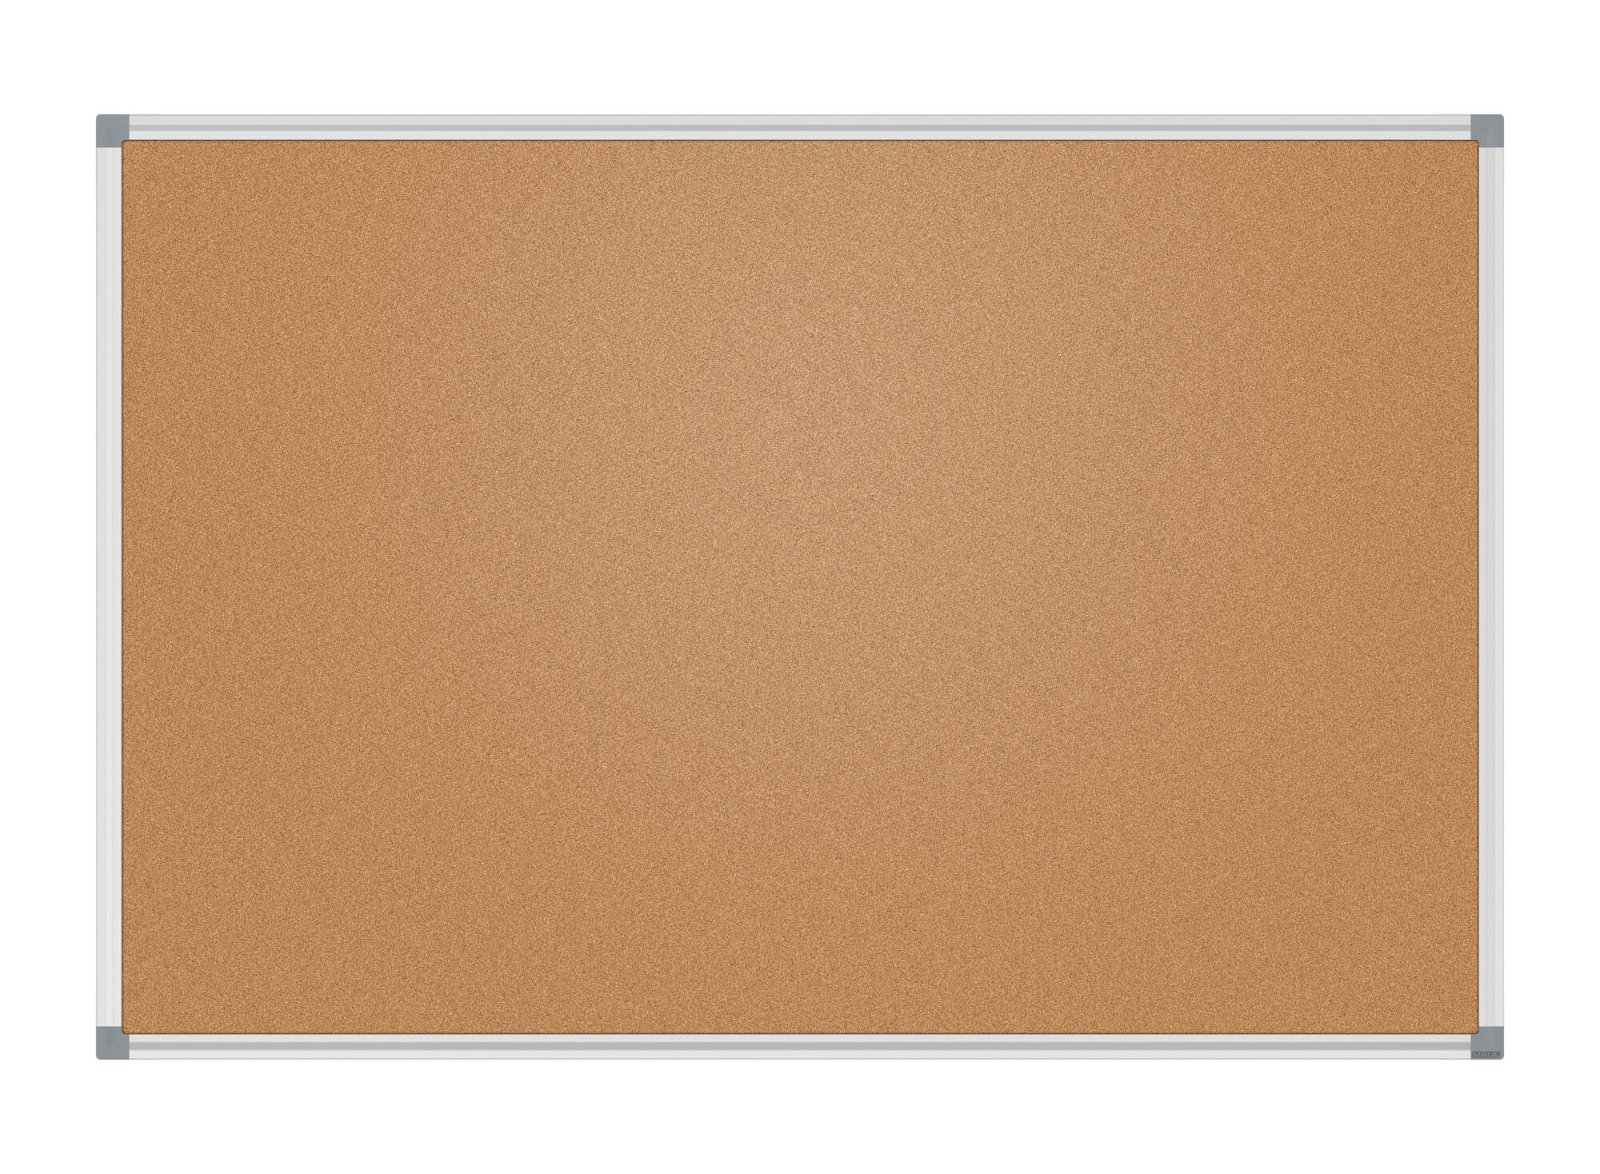 Pinnboard MAULstandard, 100x150 cm, Kork, grau